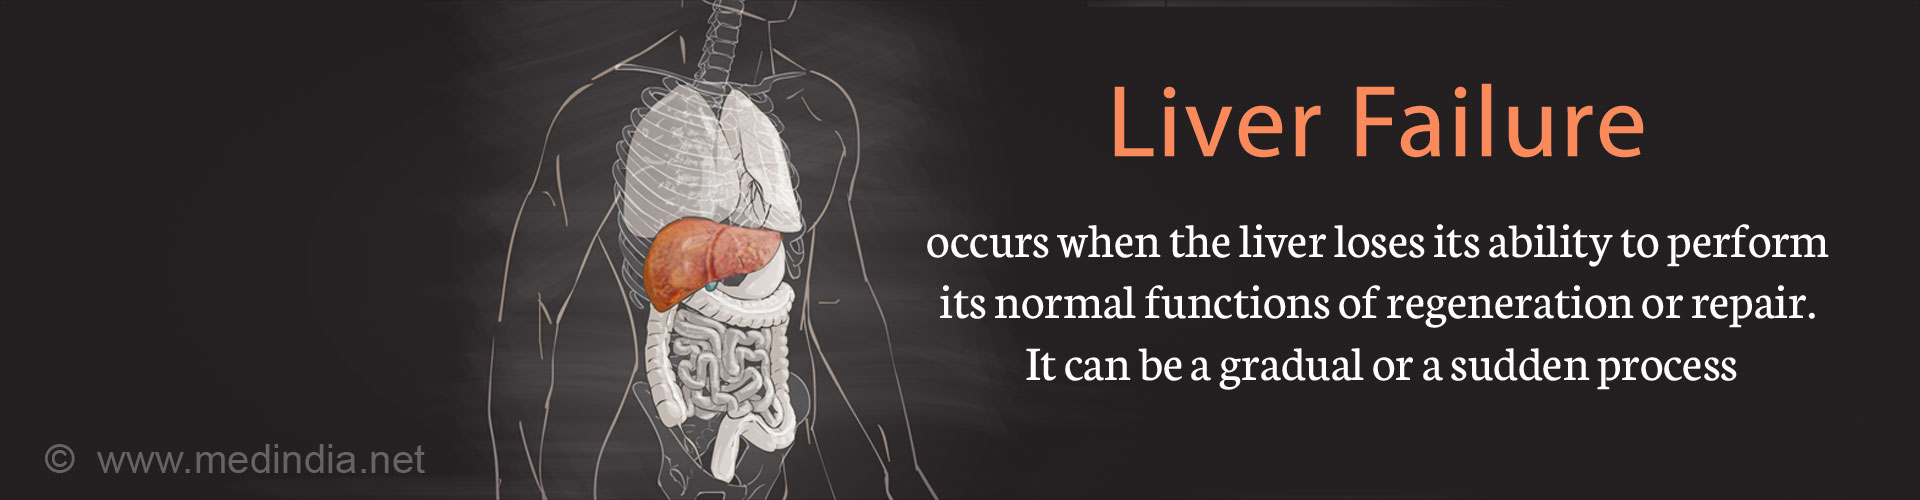 Liver Failure - Types, Causes, Symptoms, Complications, Diagnosis